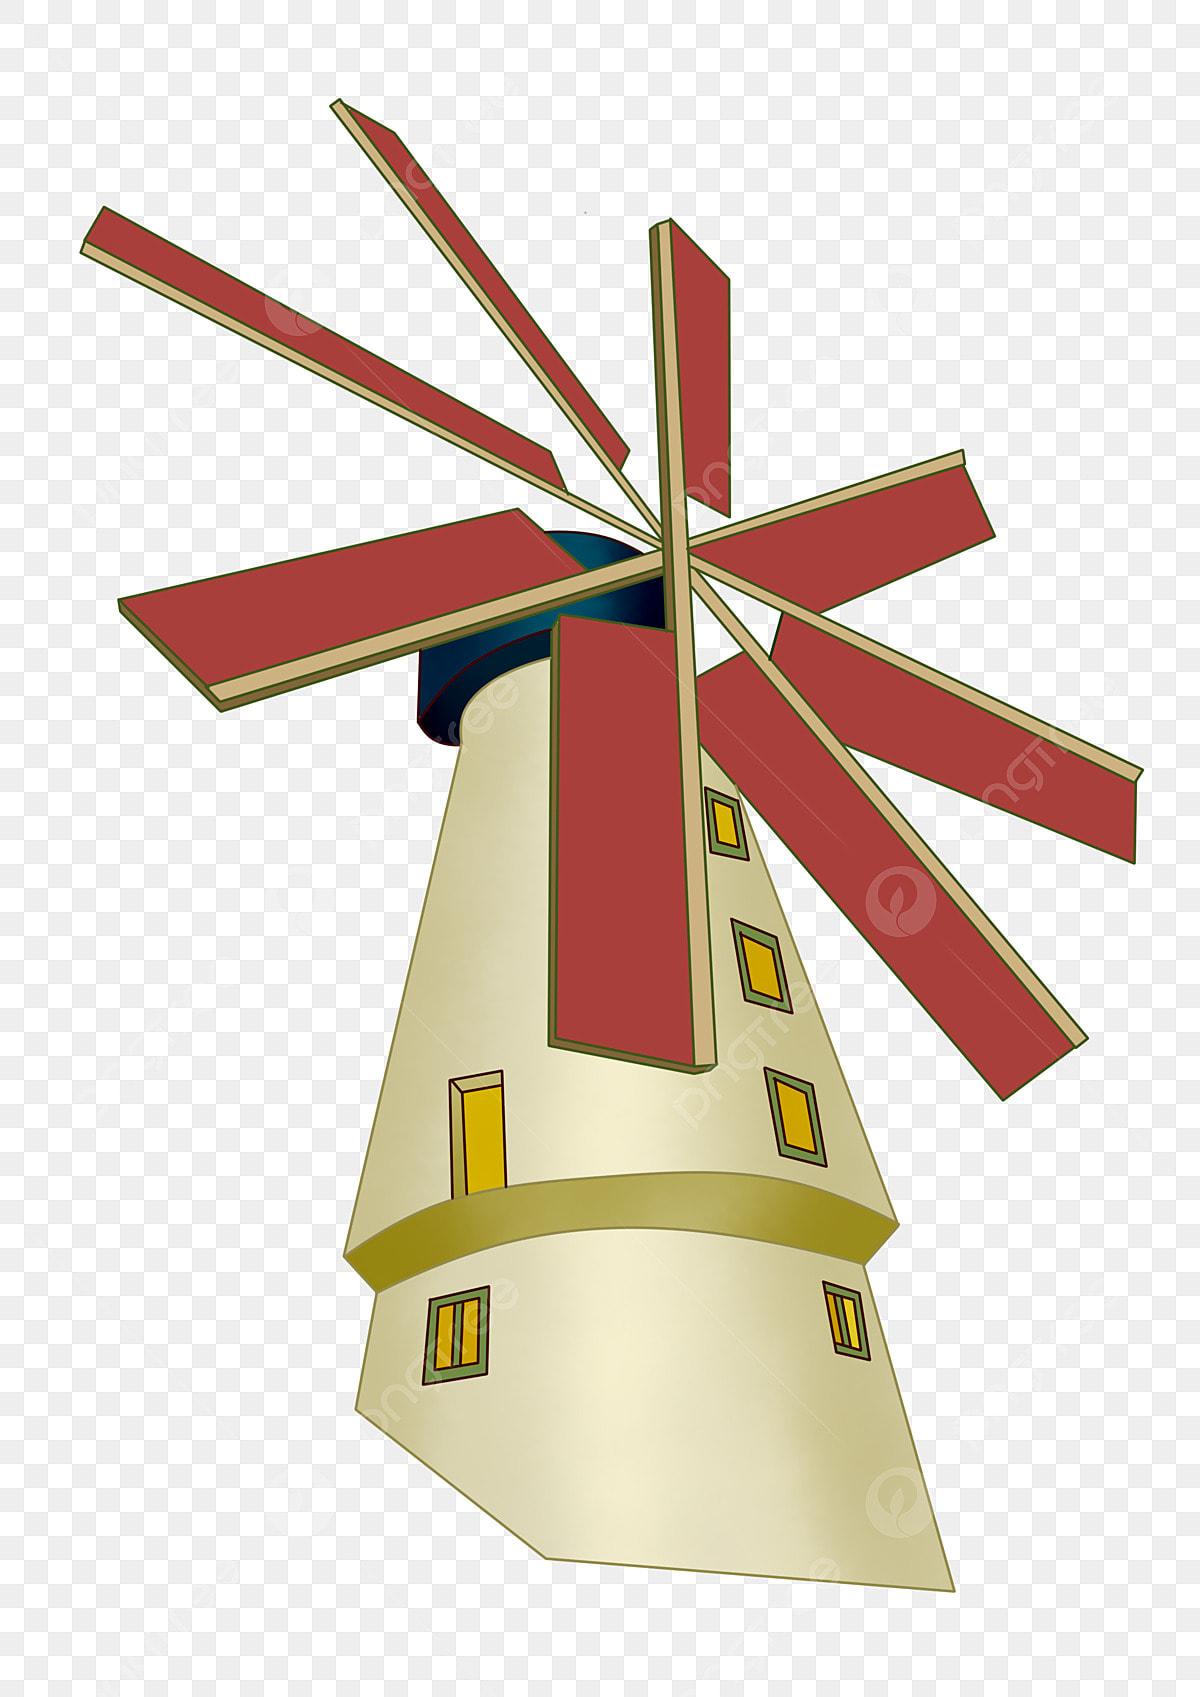 Red Fan Blade Windmill Ilration